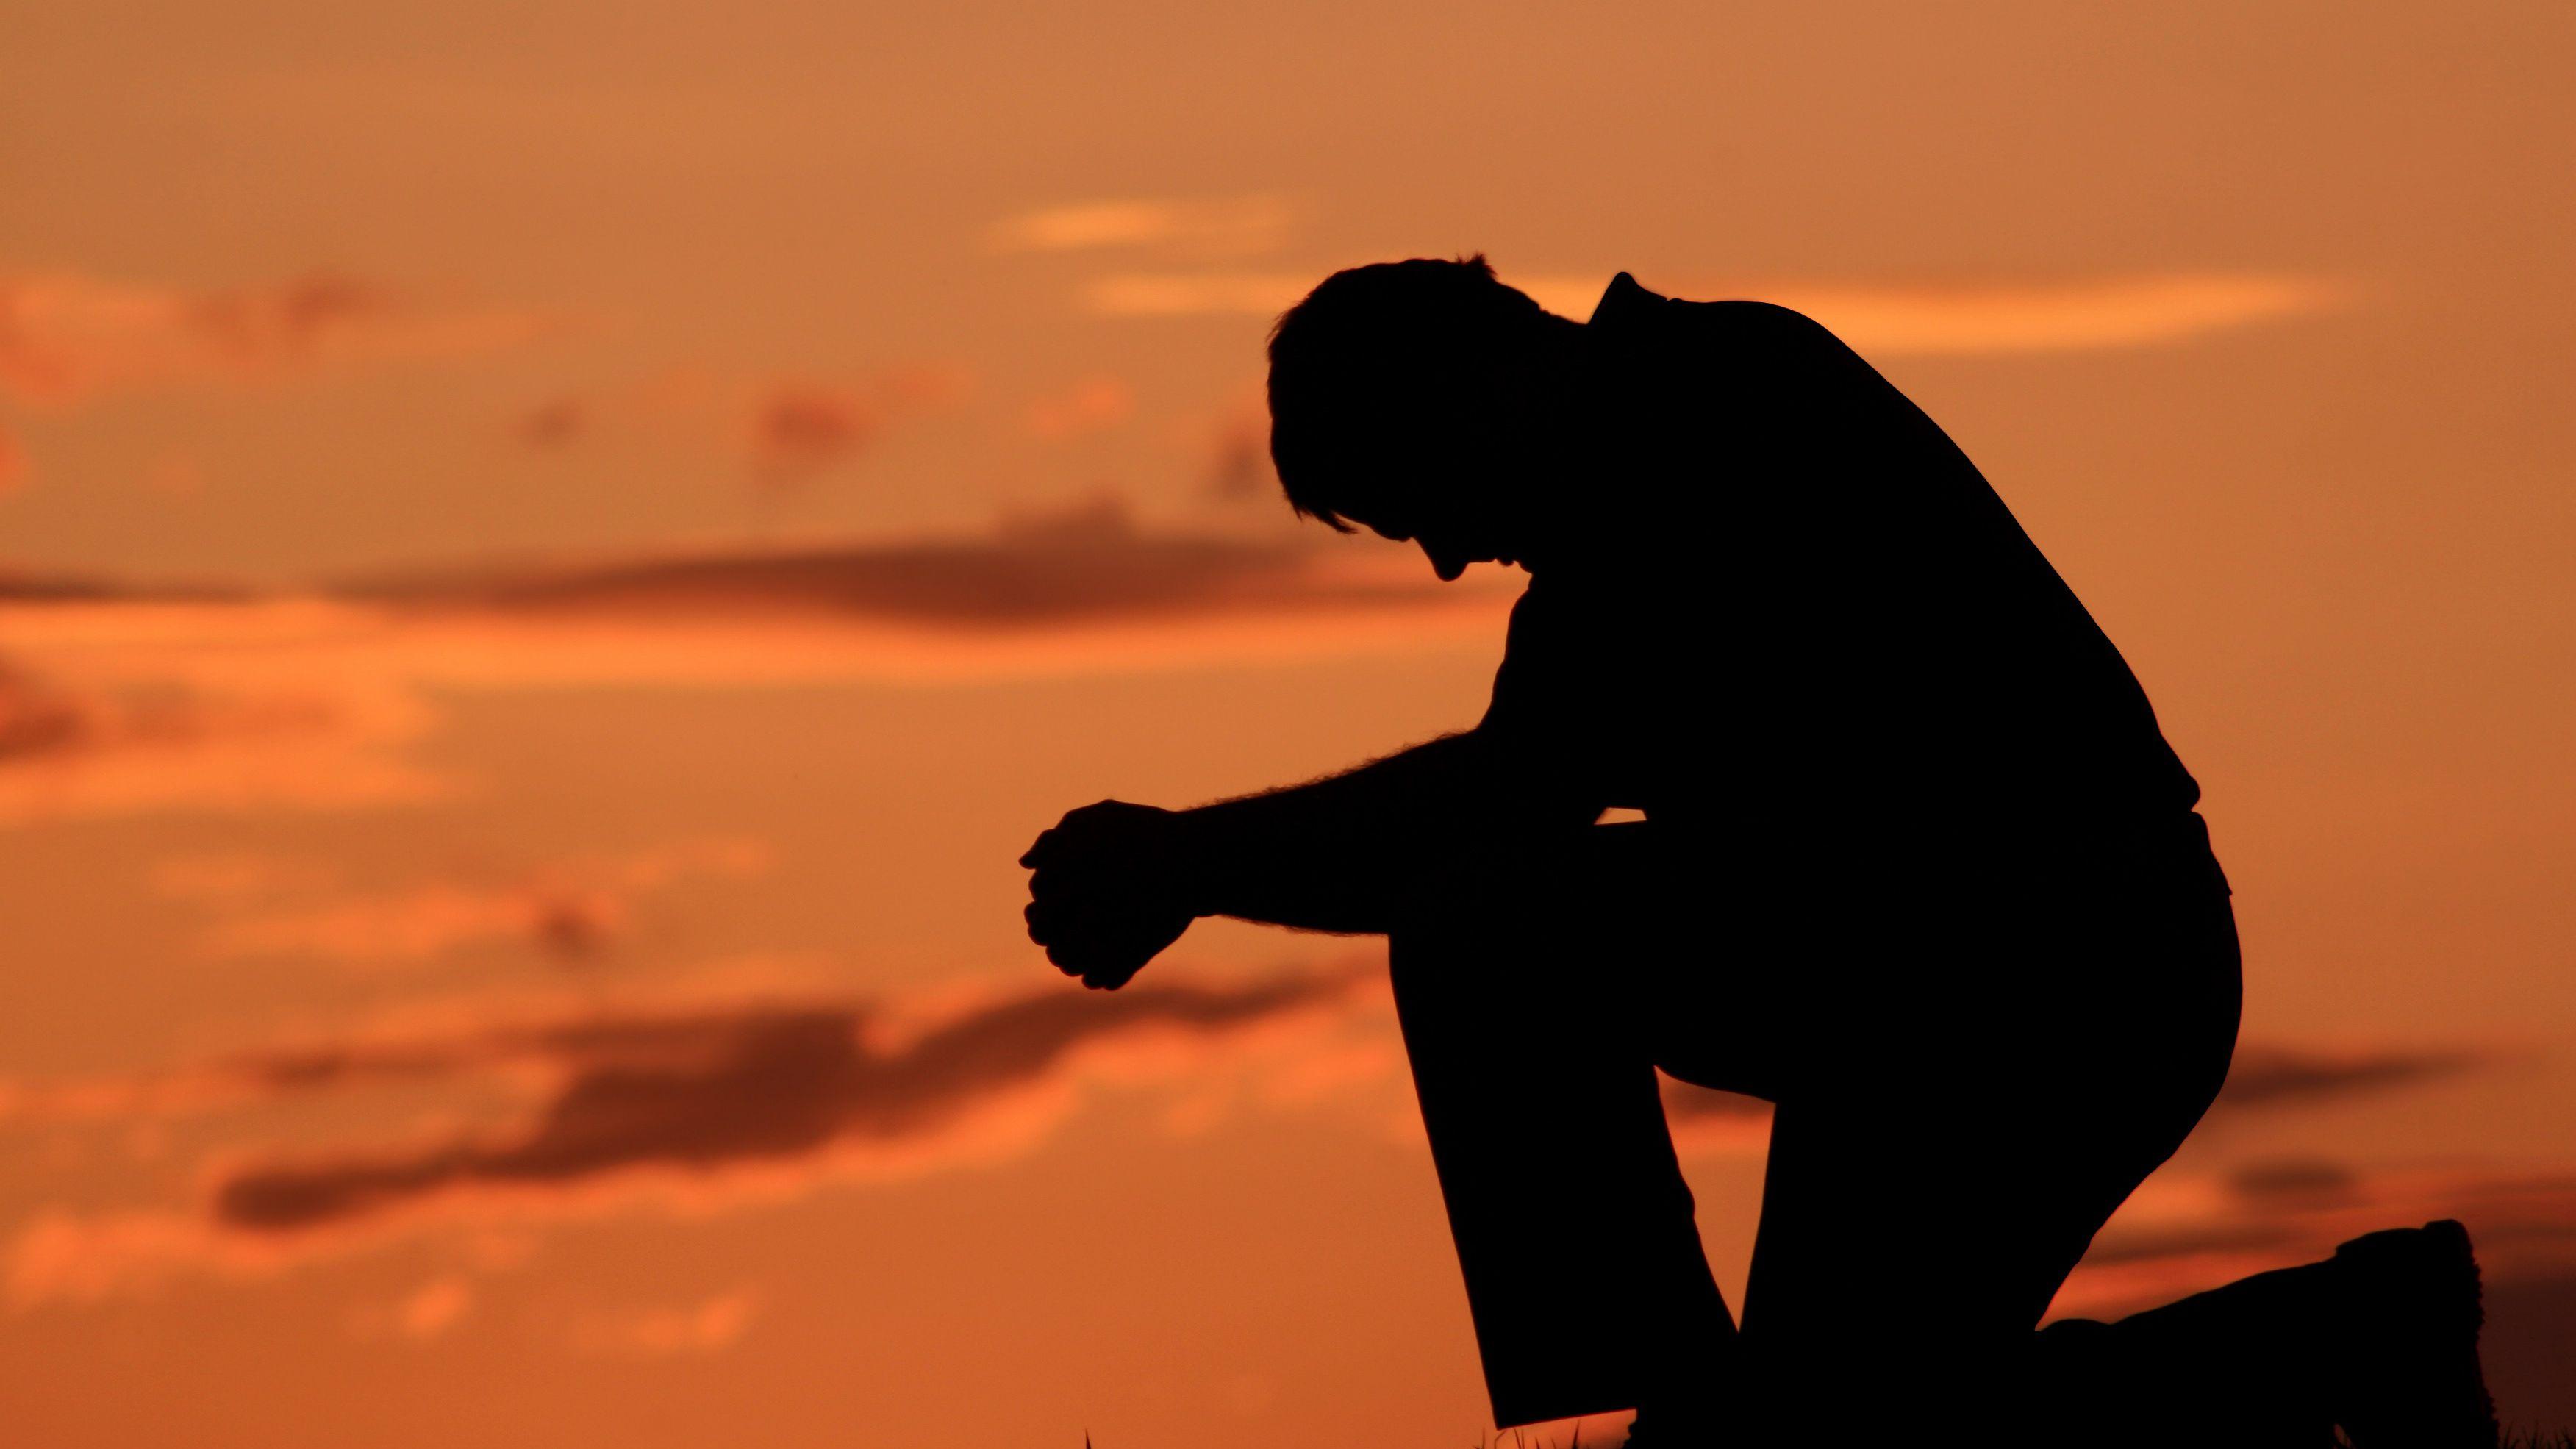 bible verses on redemption and jesus sacrifice